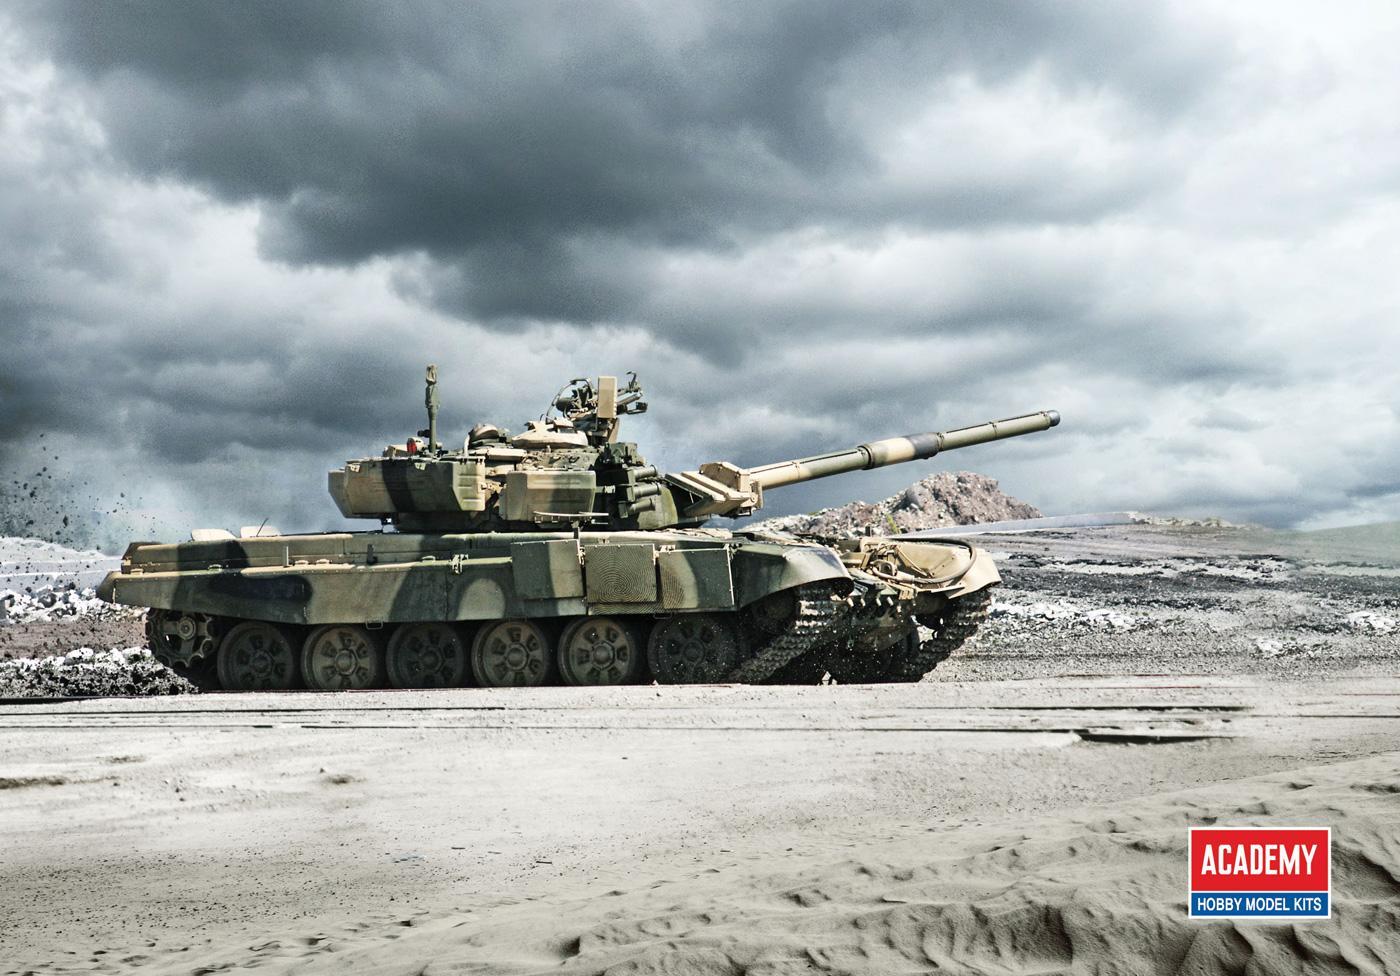 Academy Hobby Model Kits Print Ad -  T-90 Vladimir Battle Tank